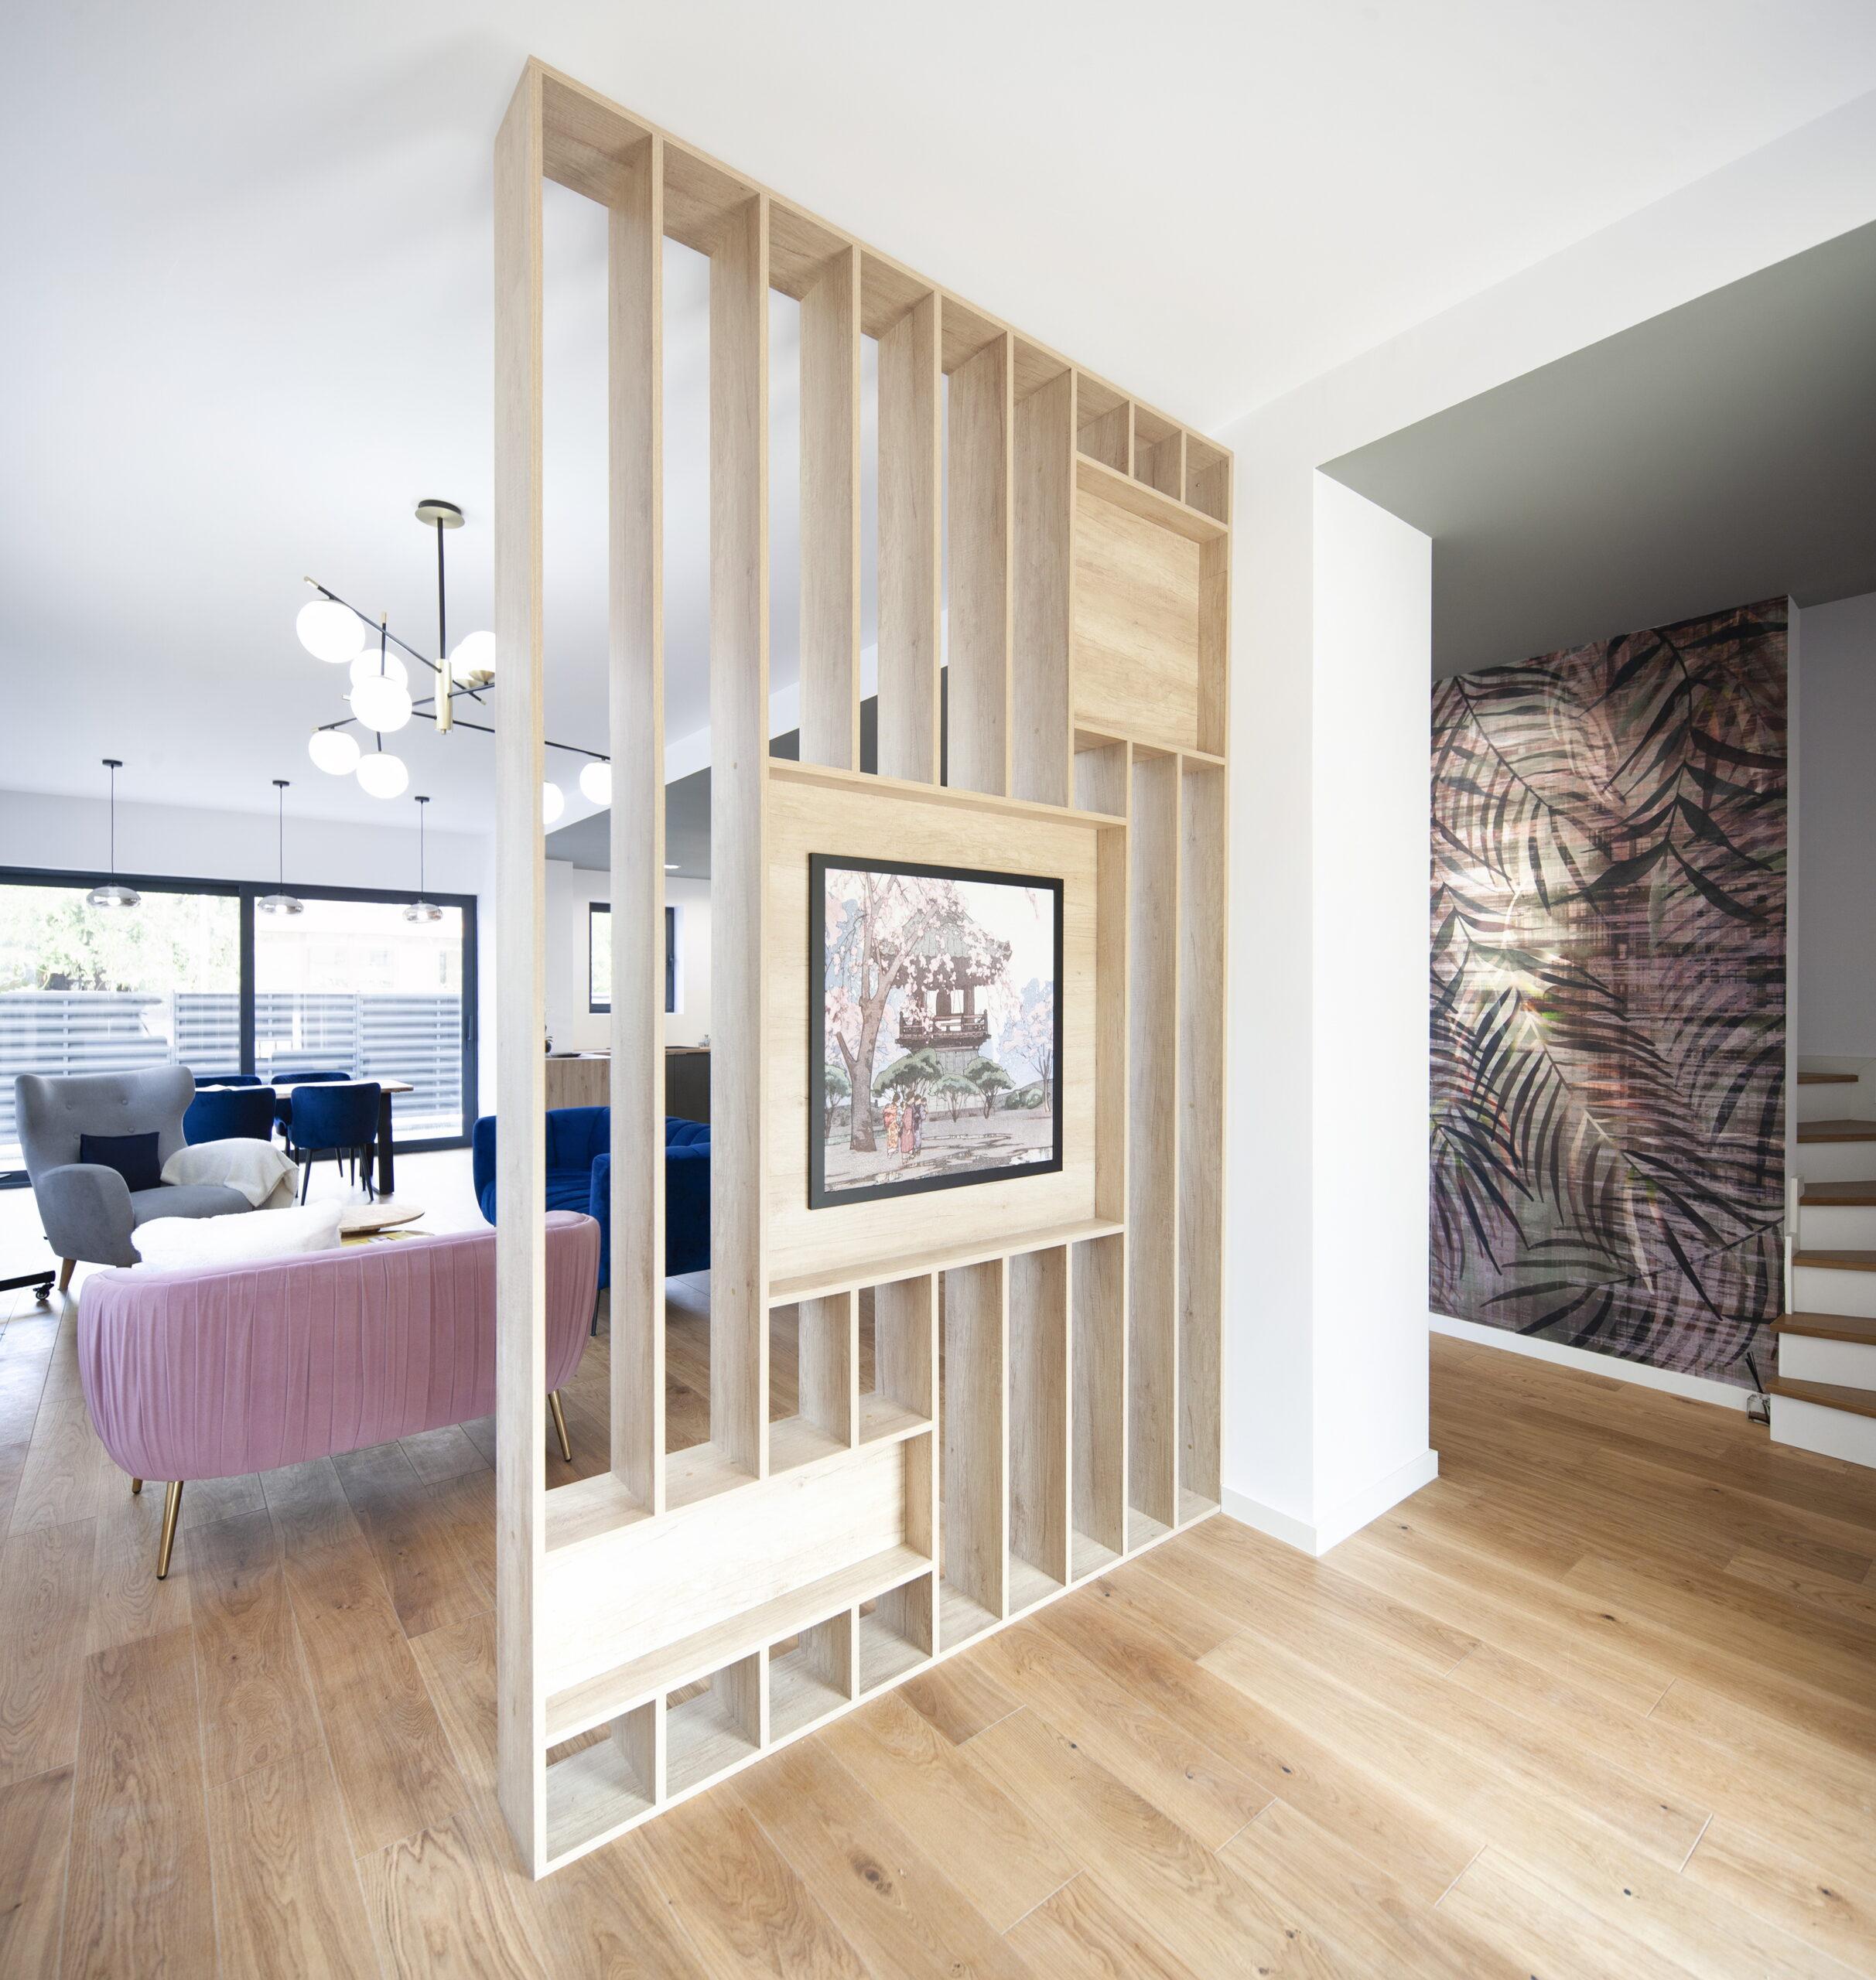 https://nbc-arhitect.ro/wp-content/uploads/2020/11/Collection-10_4-Design-Interior-scaled.jpg